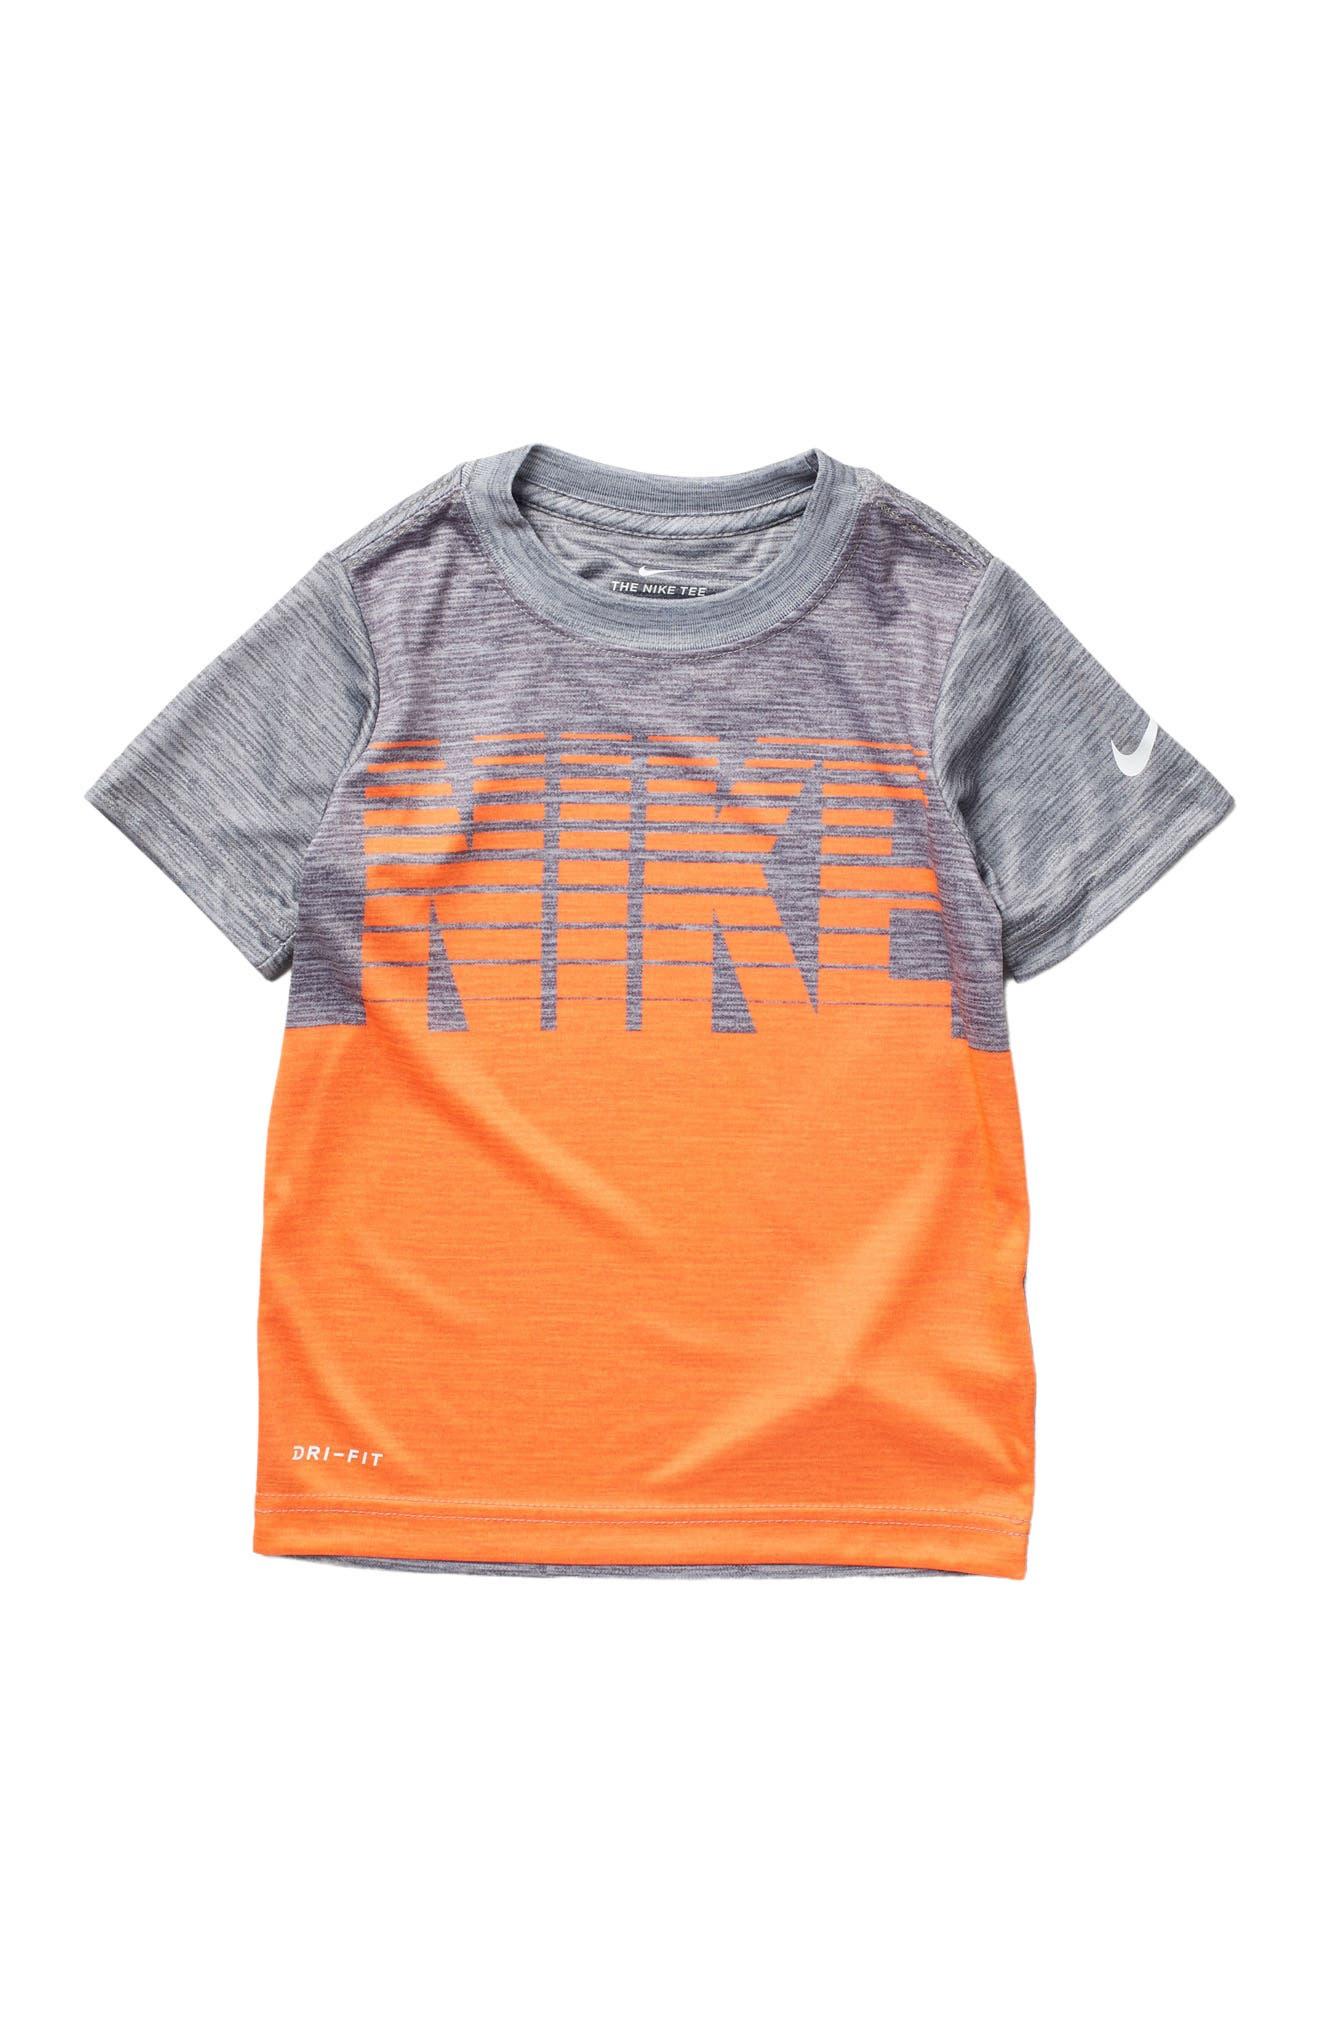 Image of Nike Block Stacked Short Sleeve Tee